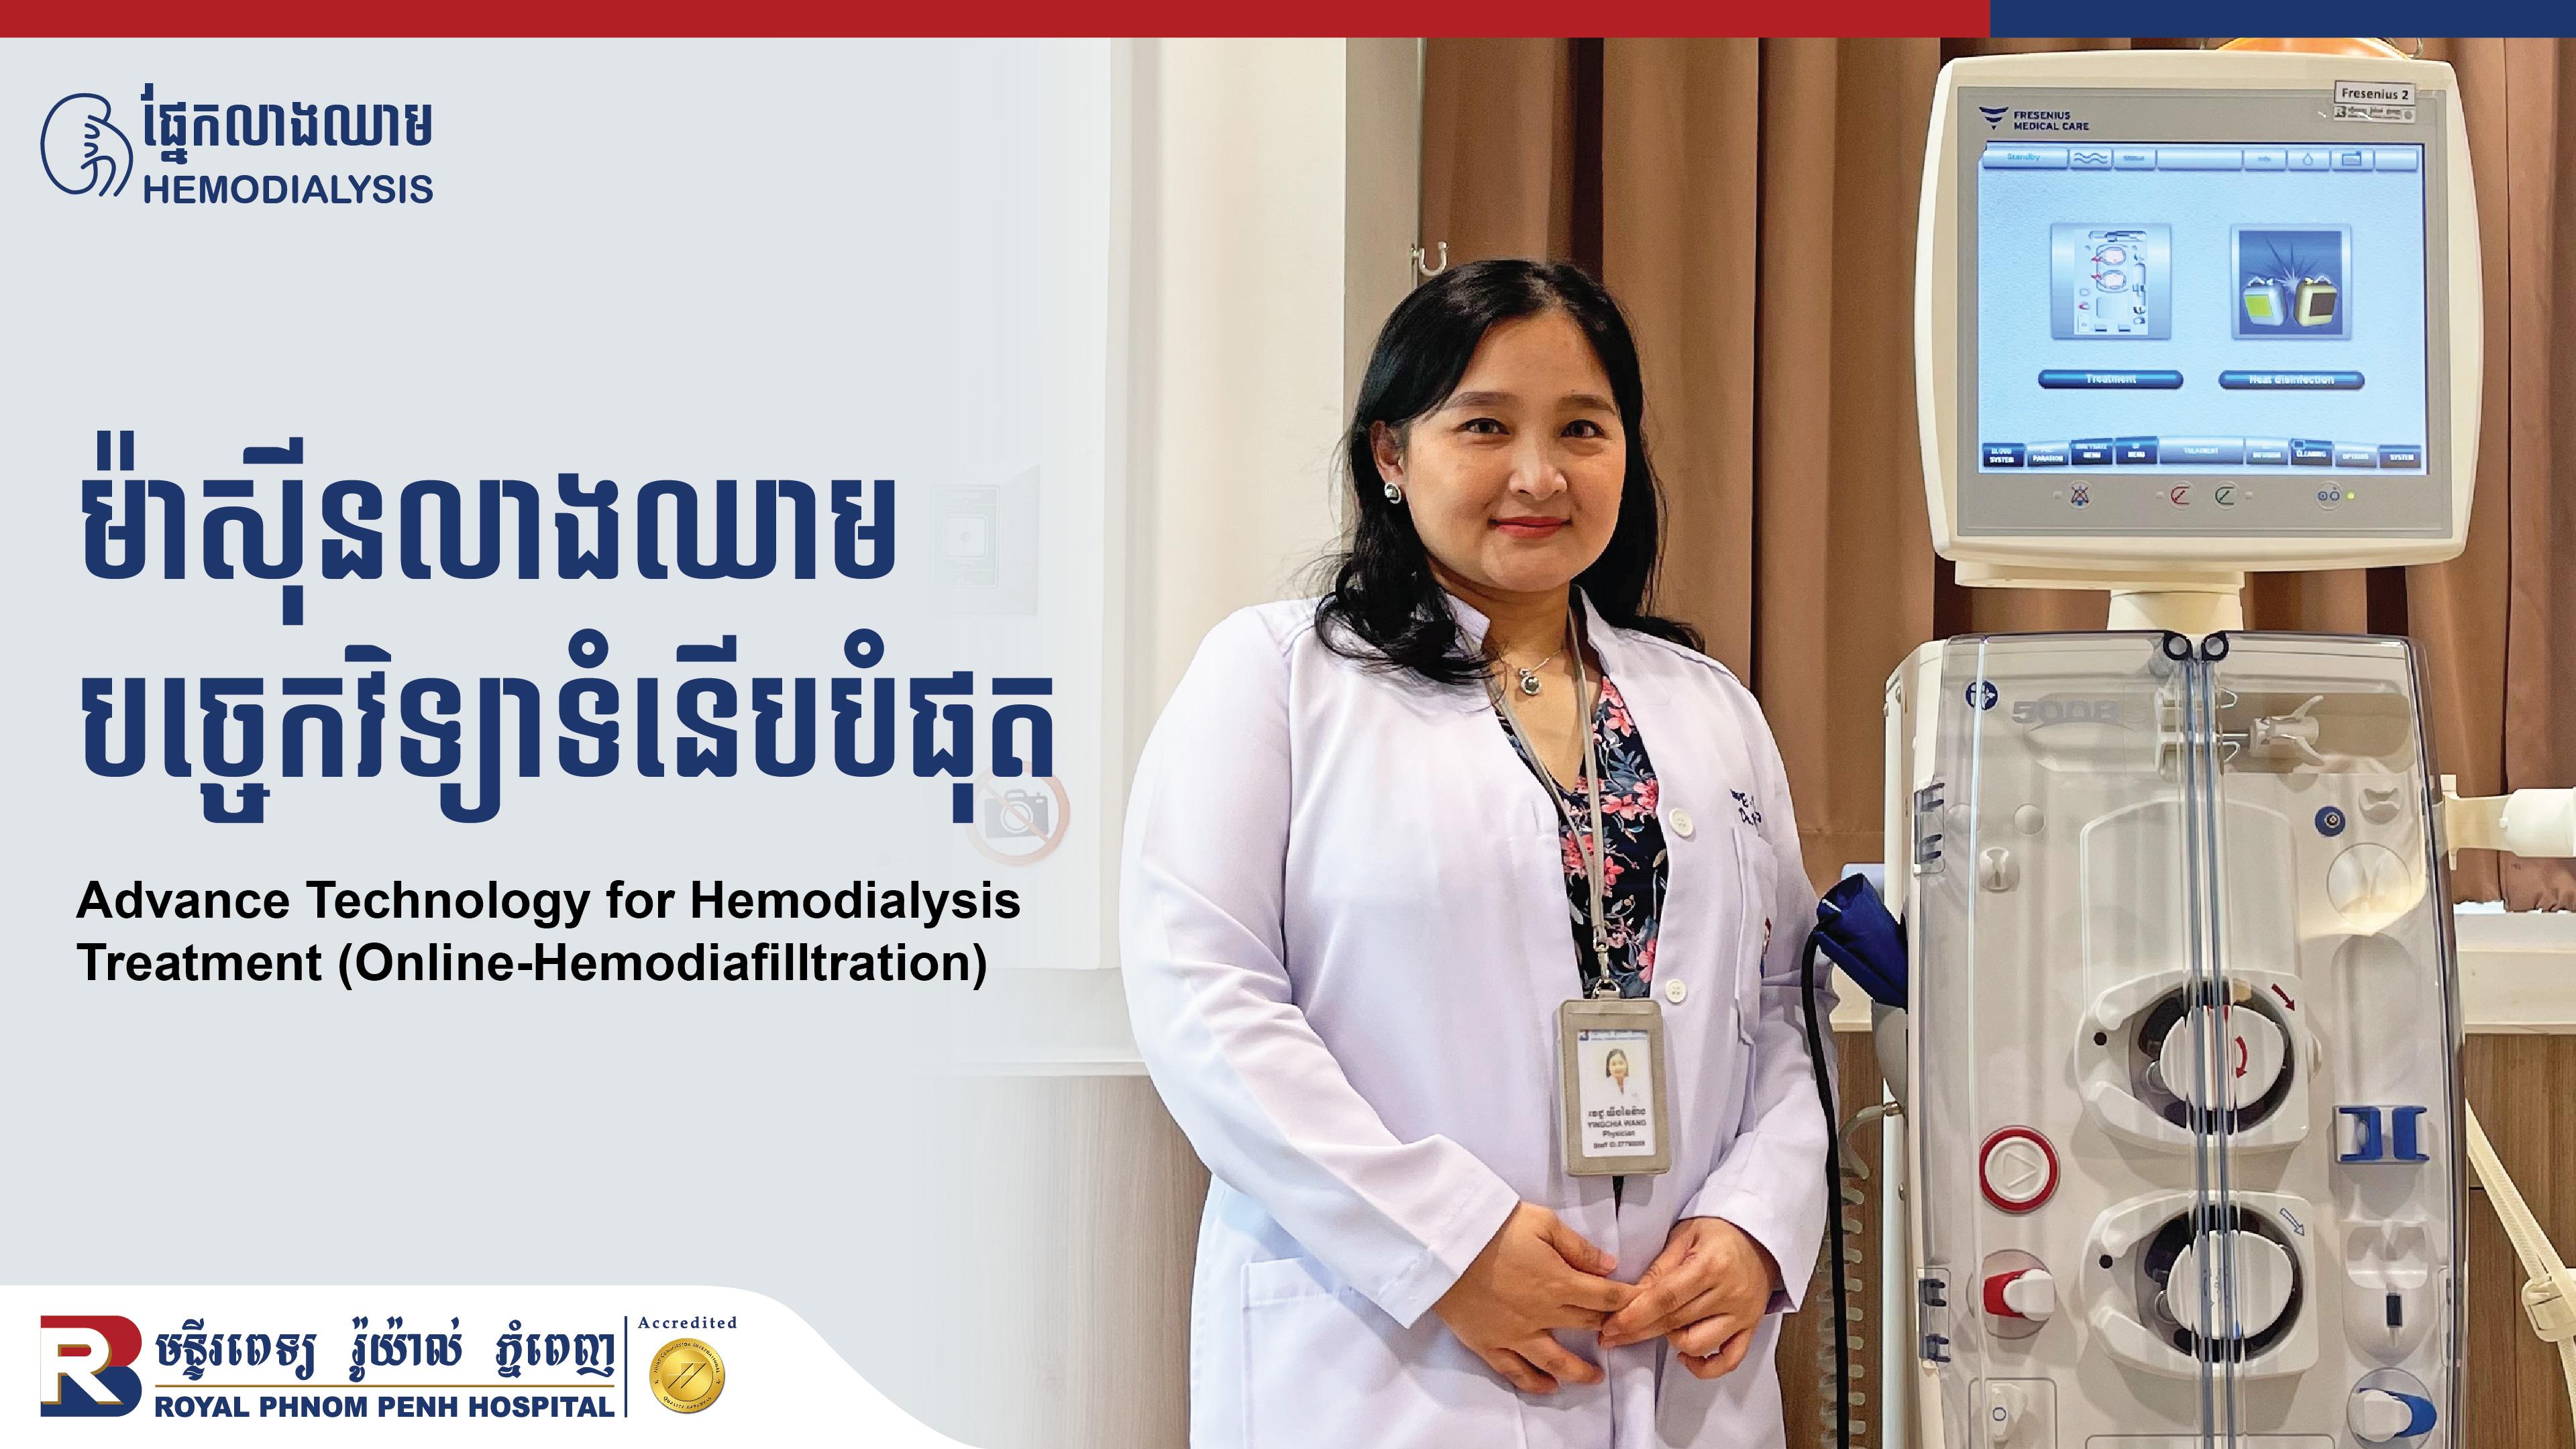 Advance Technology  for Hemodialysis Treatment (Online-Hemodiafilltration)